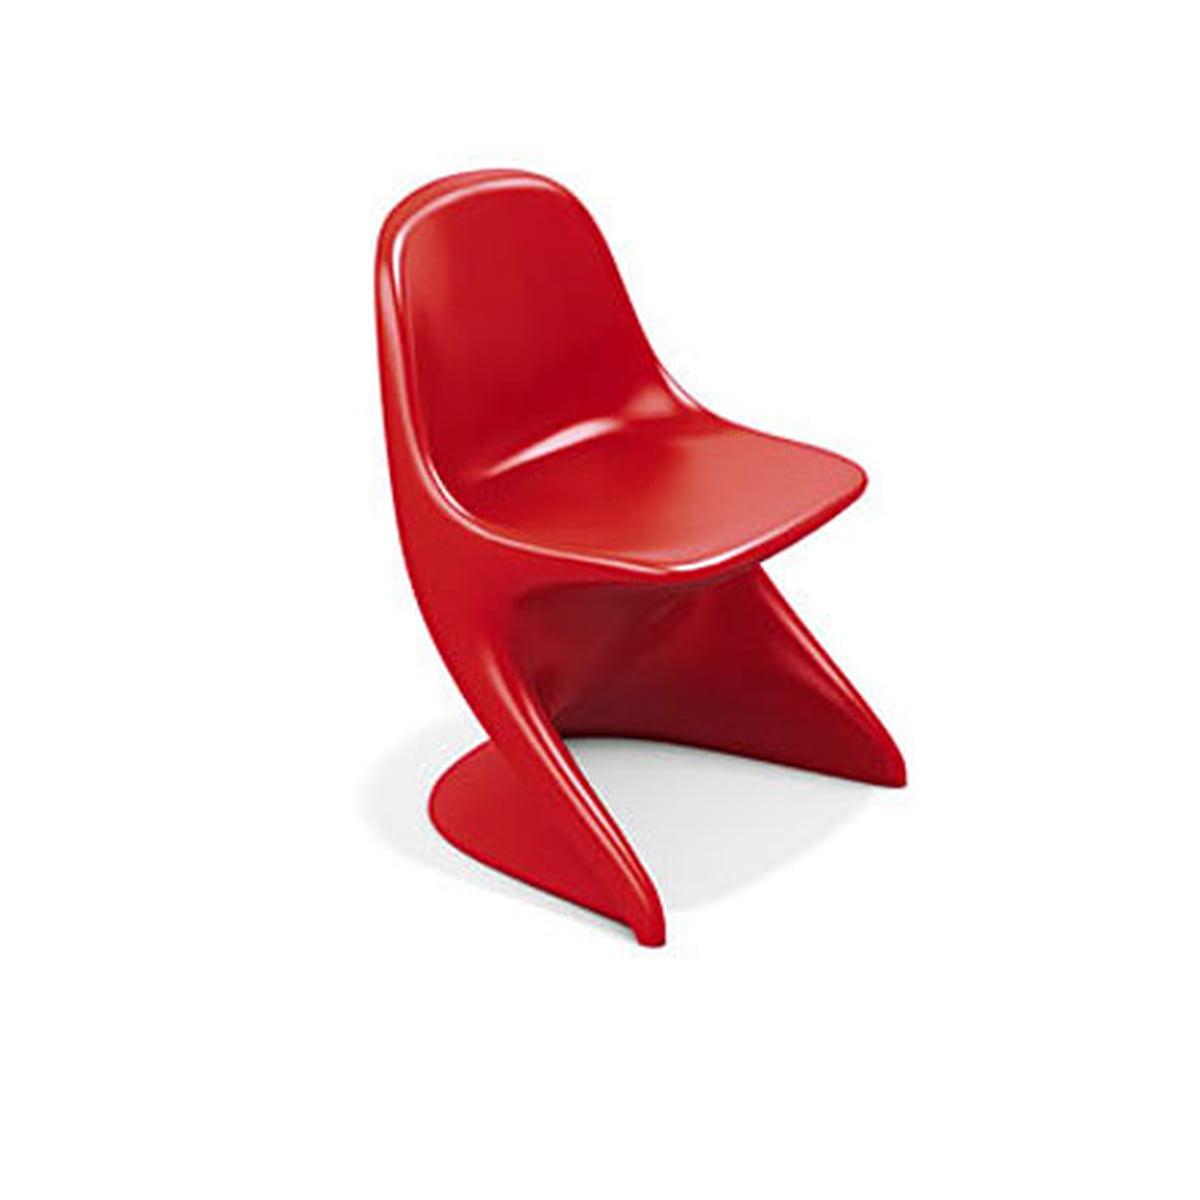 Casala - Casalino Junior Kinderstuhl 2000/00 rot | Kinderzimmer > Kinderzimmerstühle | Rot | Casala